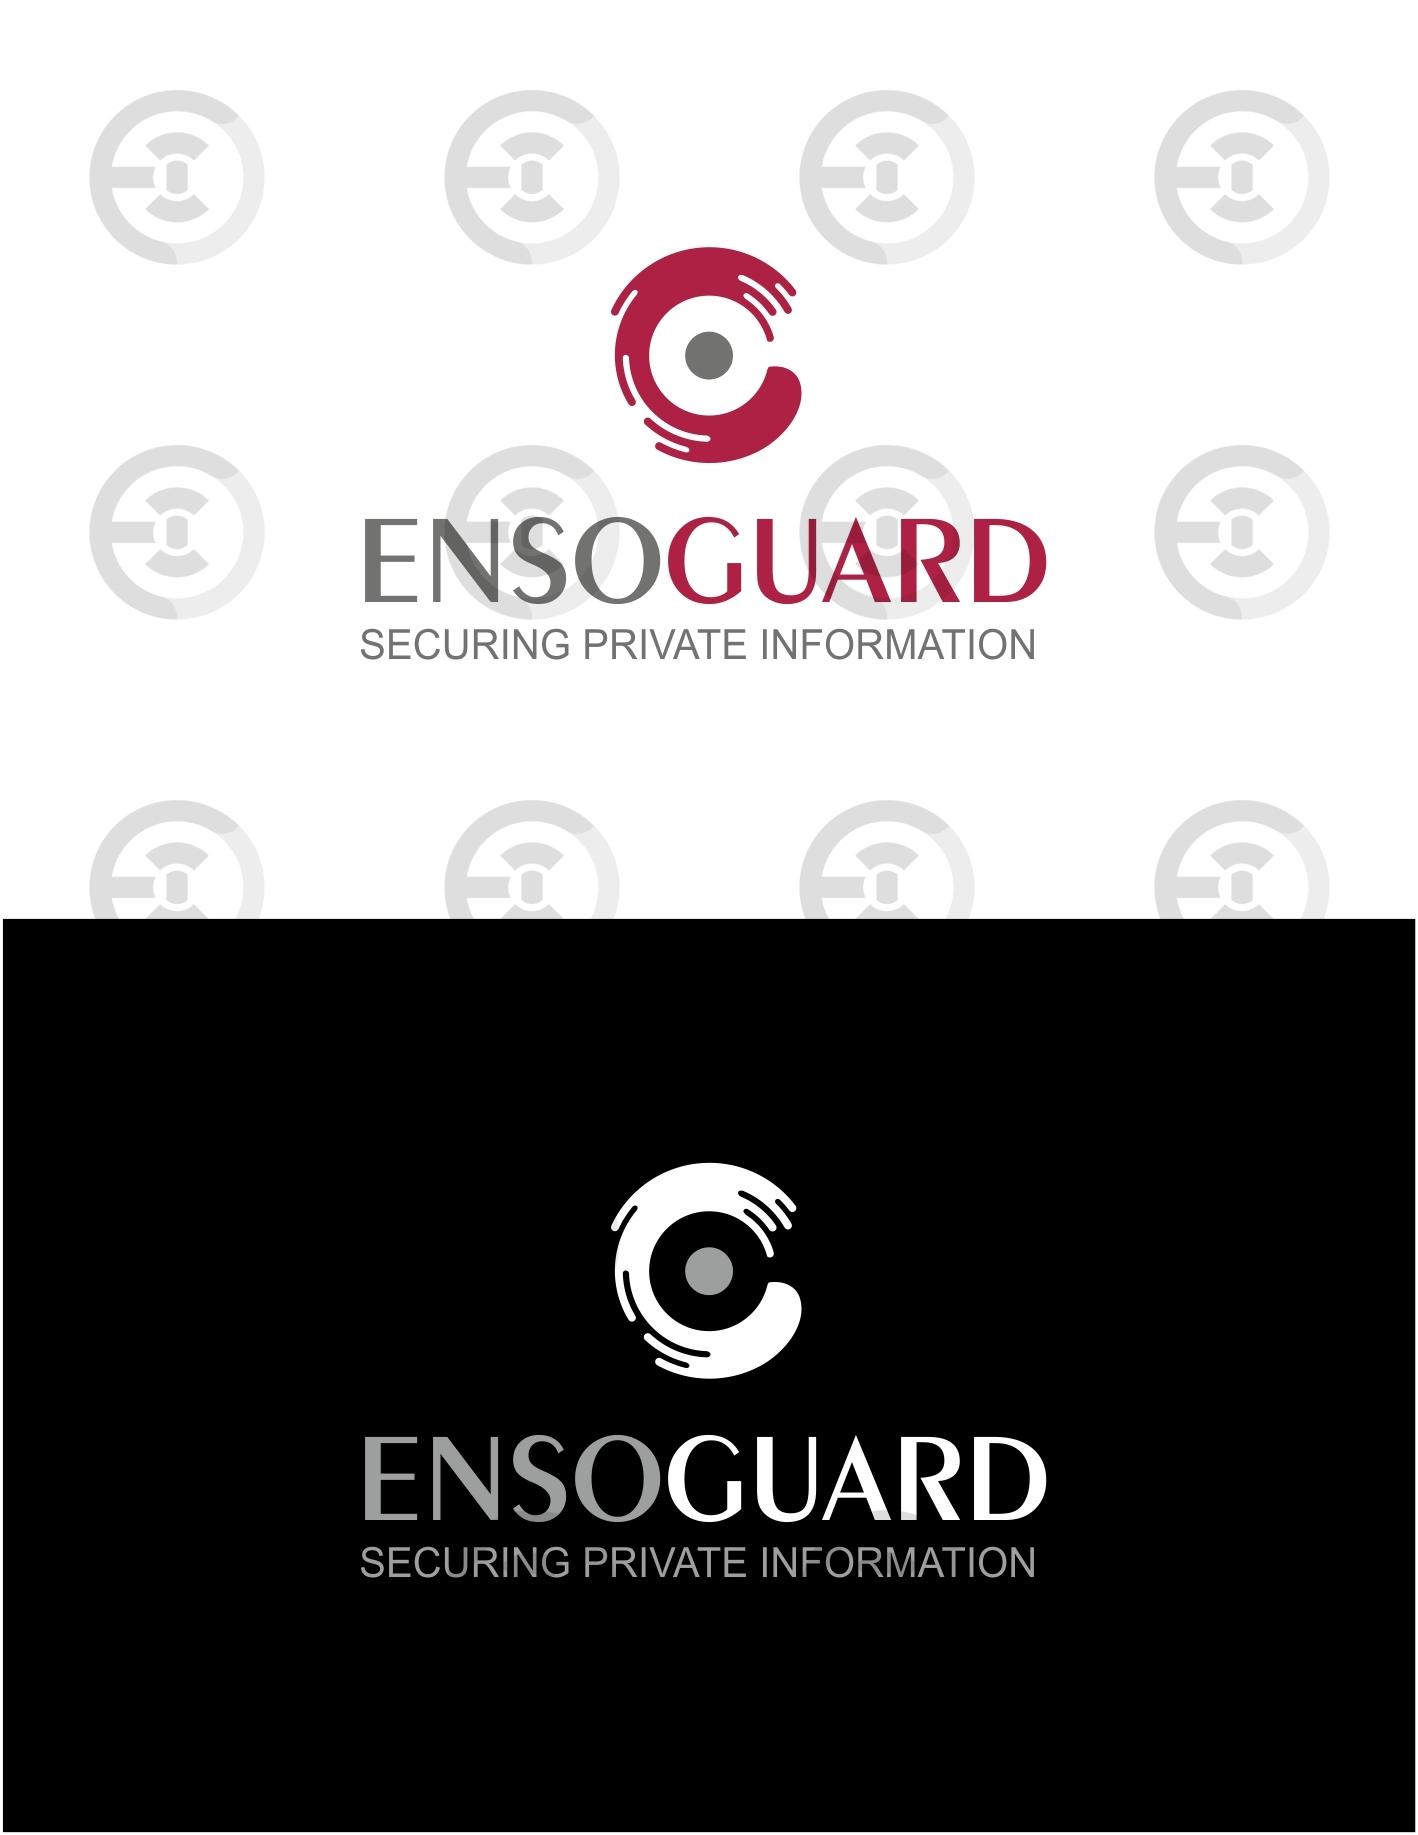 EnsoGuard3.jpg